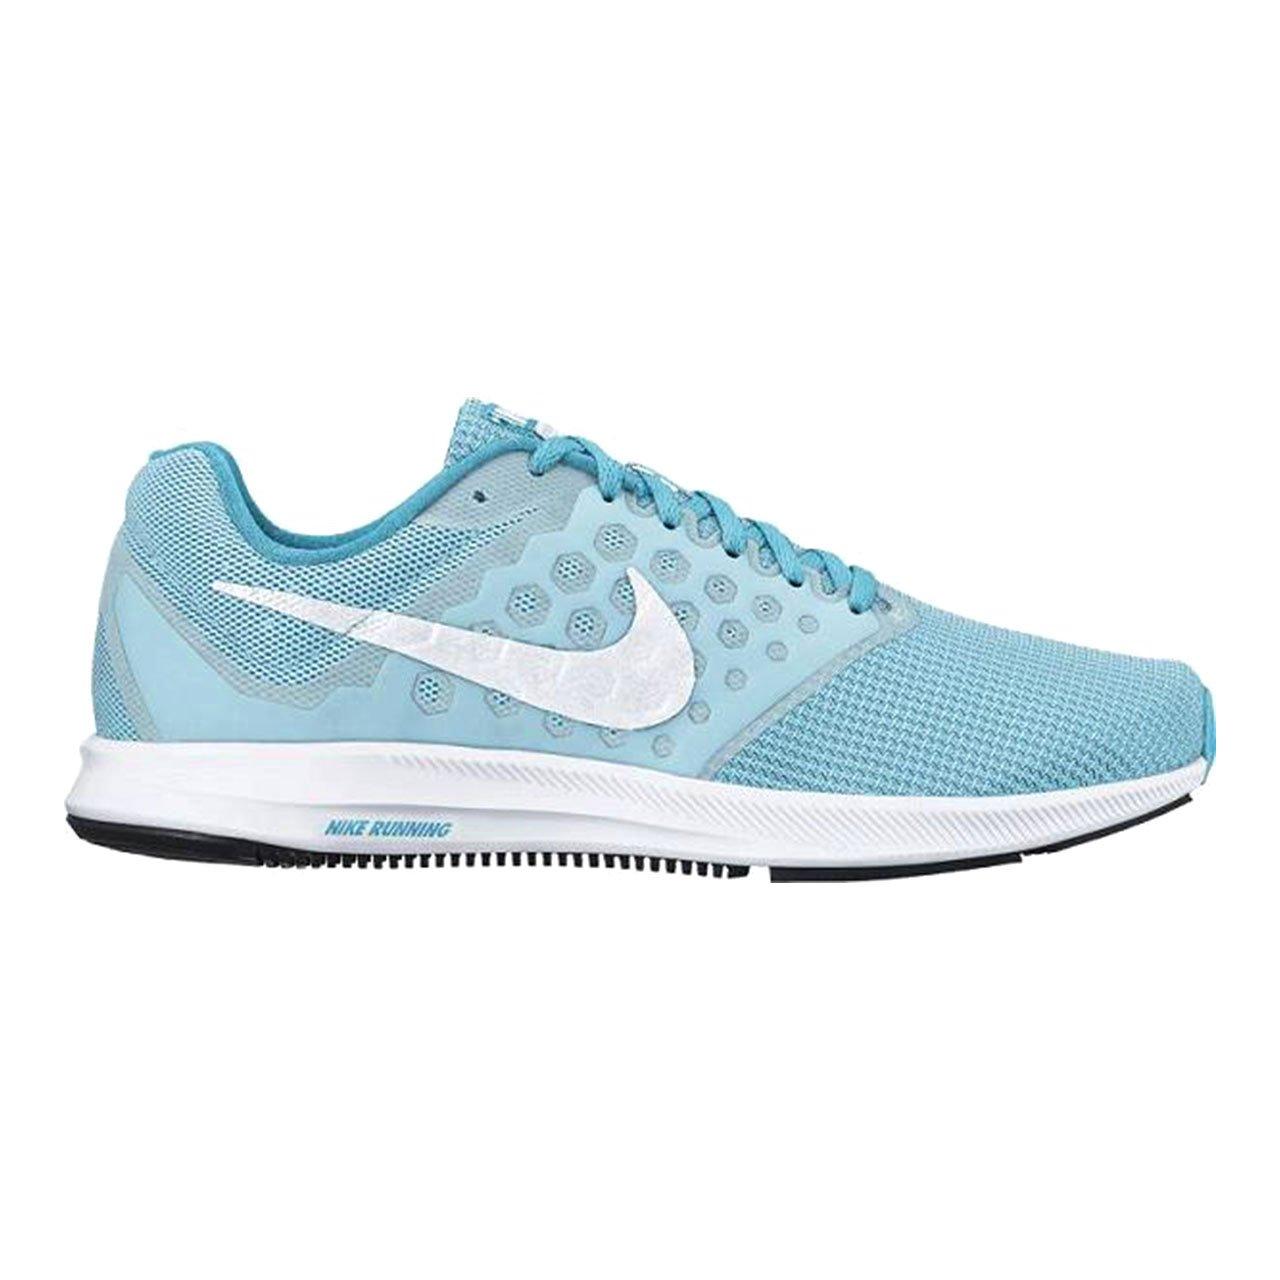 9fa3cd3146d911 Galleon - New Nike Women s Downshifter 7 Running Shoe Blue Chlorine 9.5